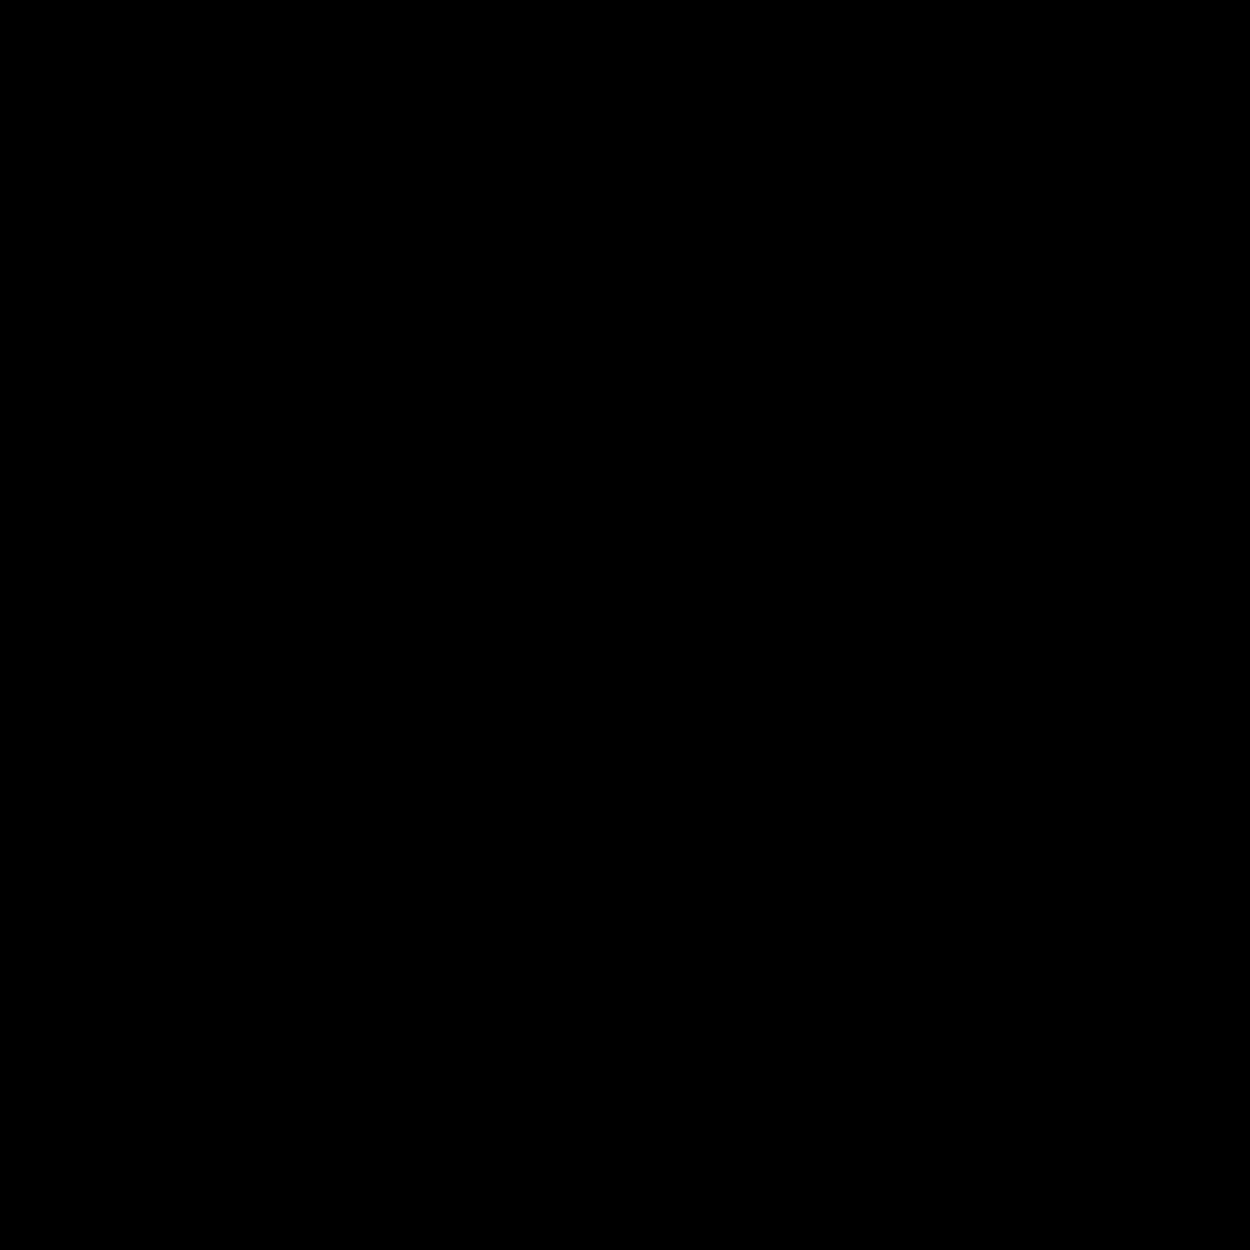 BOLO LEFRANC & BOURGEOIS